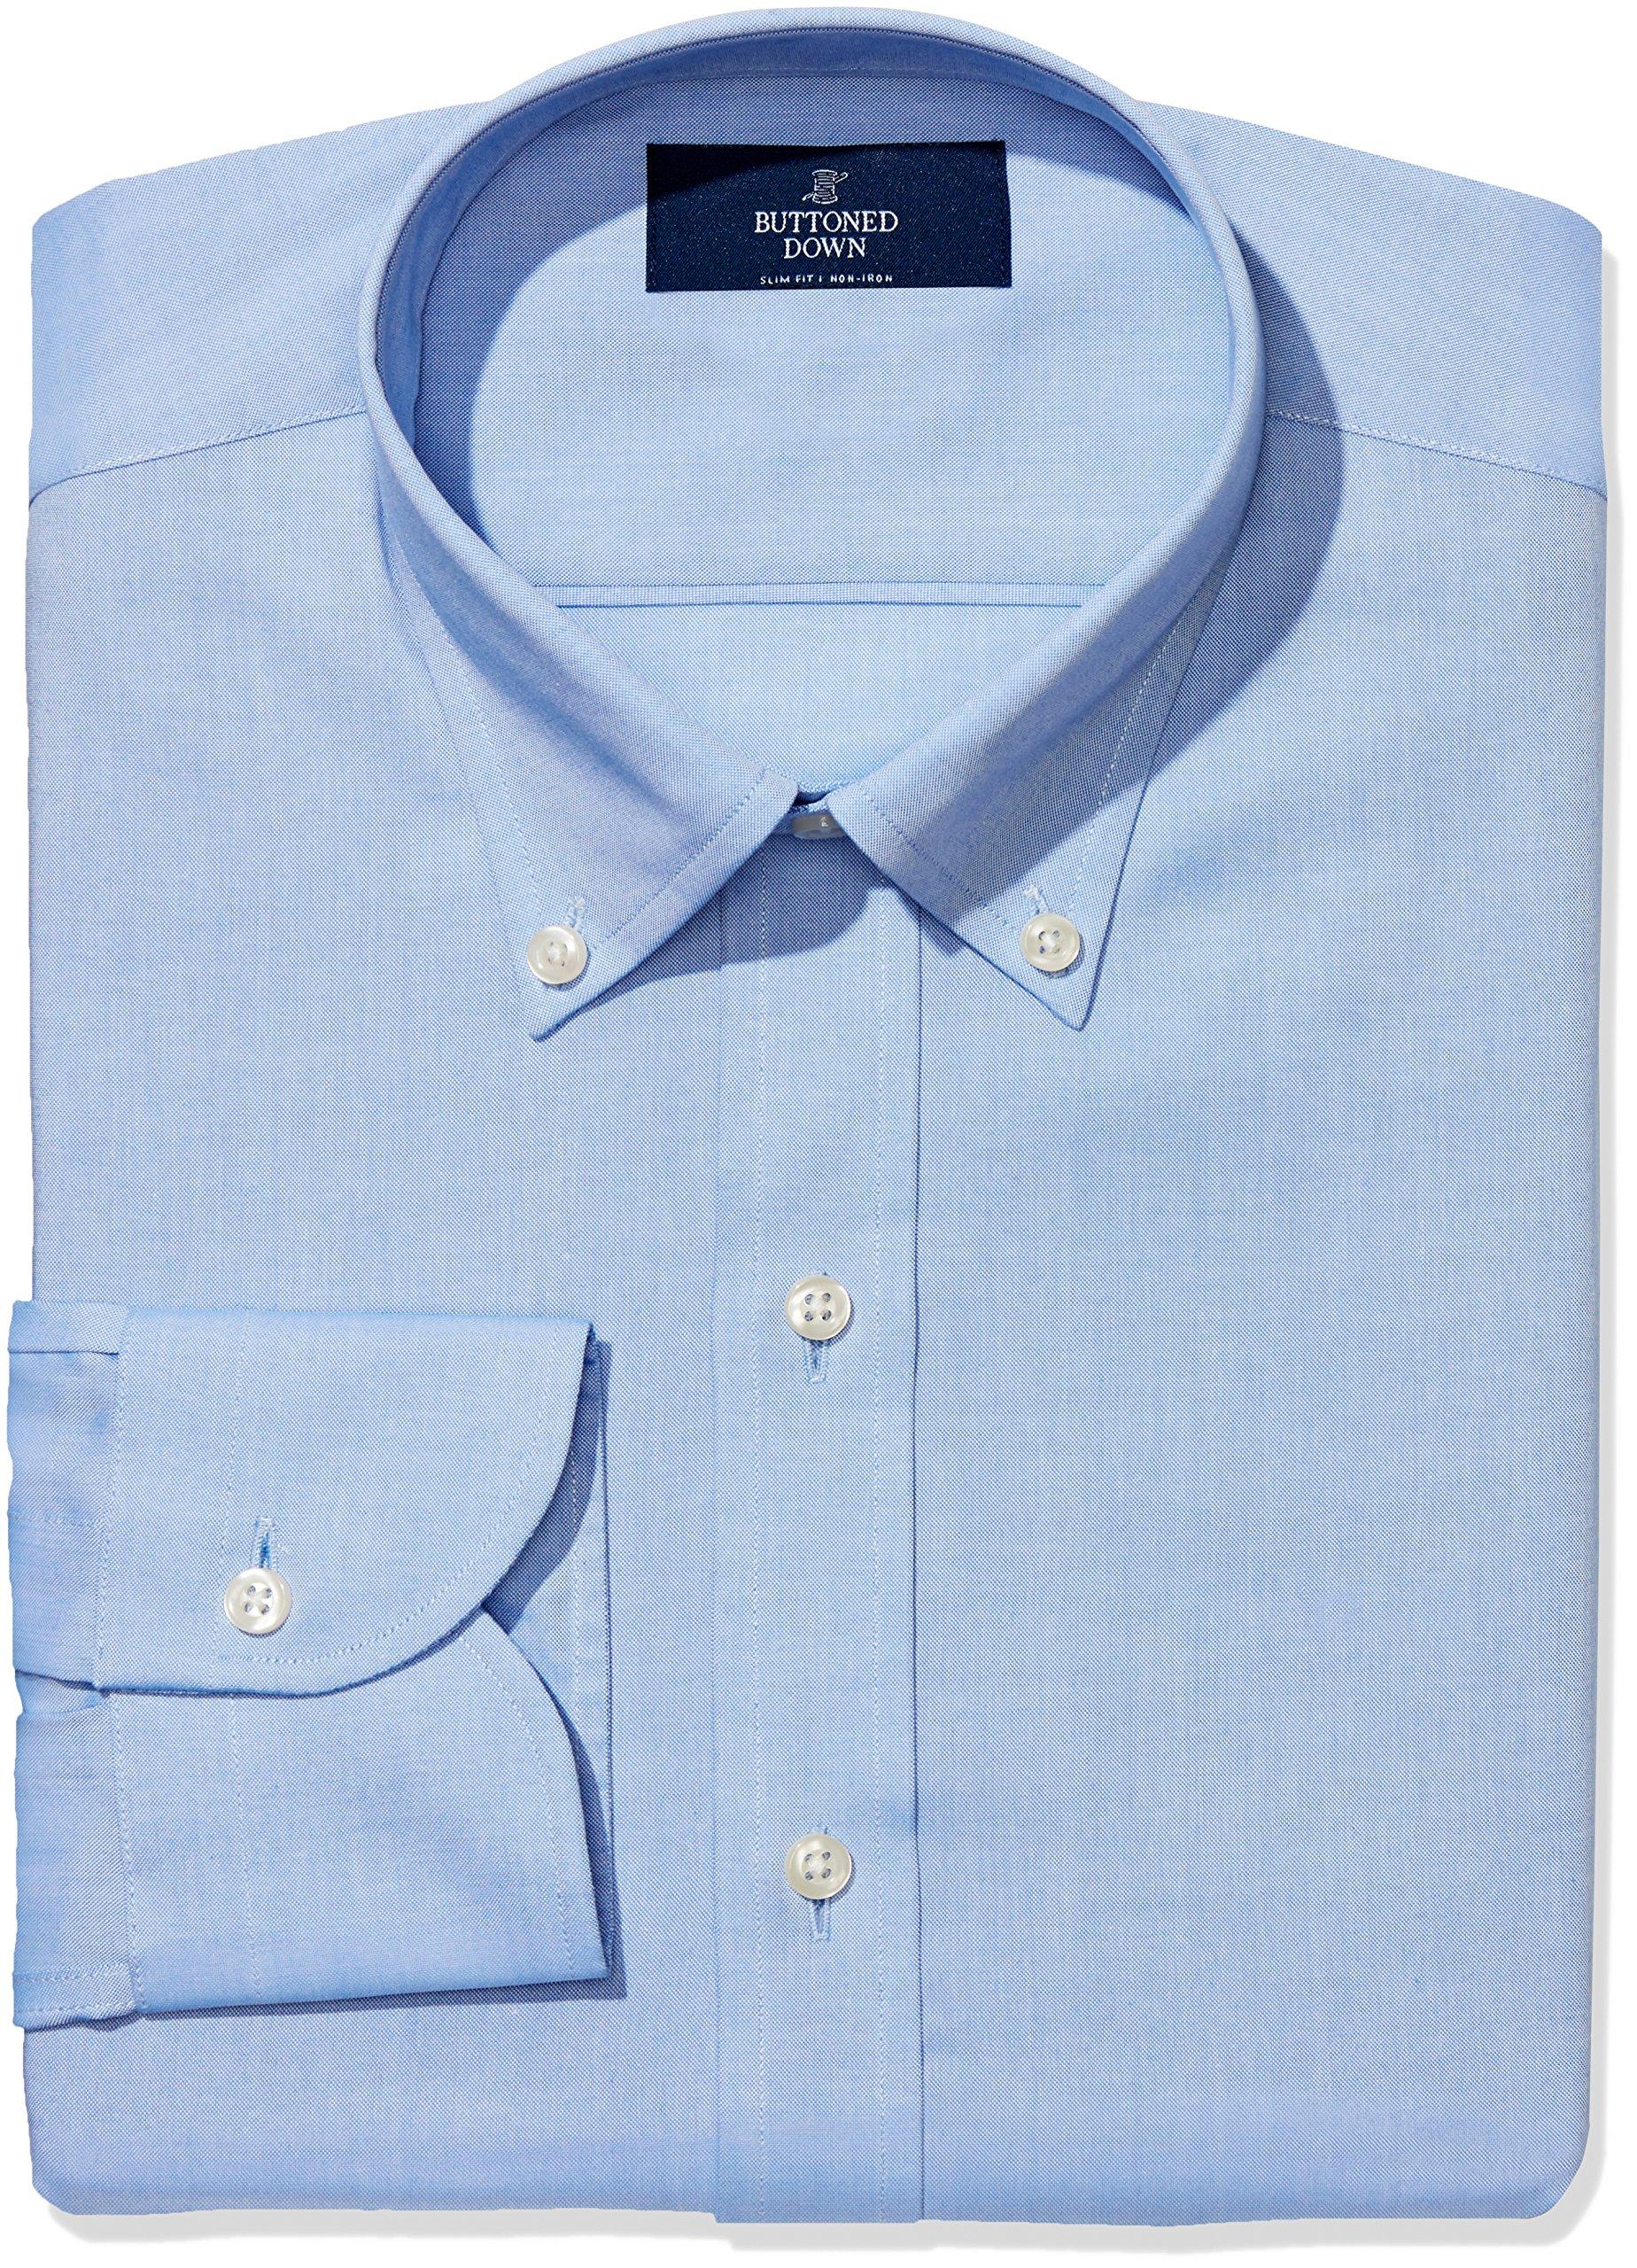 BUTTONED DOWN Men's Slim Fit Button-Collar Non-Iron Dress Shirt (No Pocket), Blue, 15.5'' Neck 36'' Sleeve